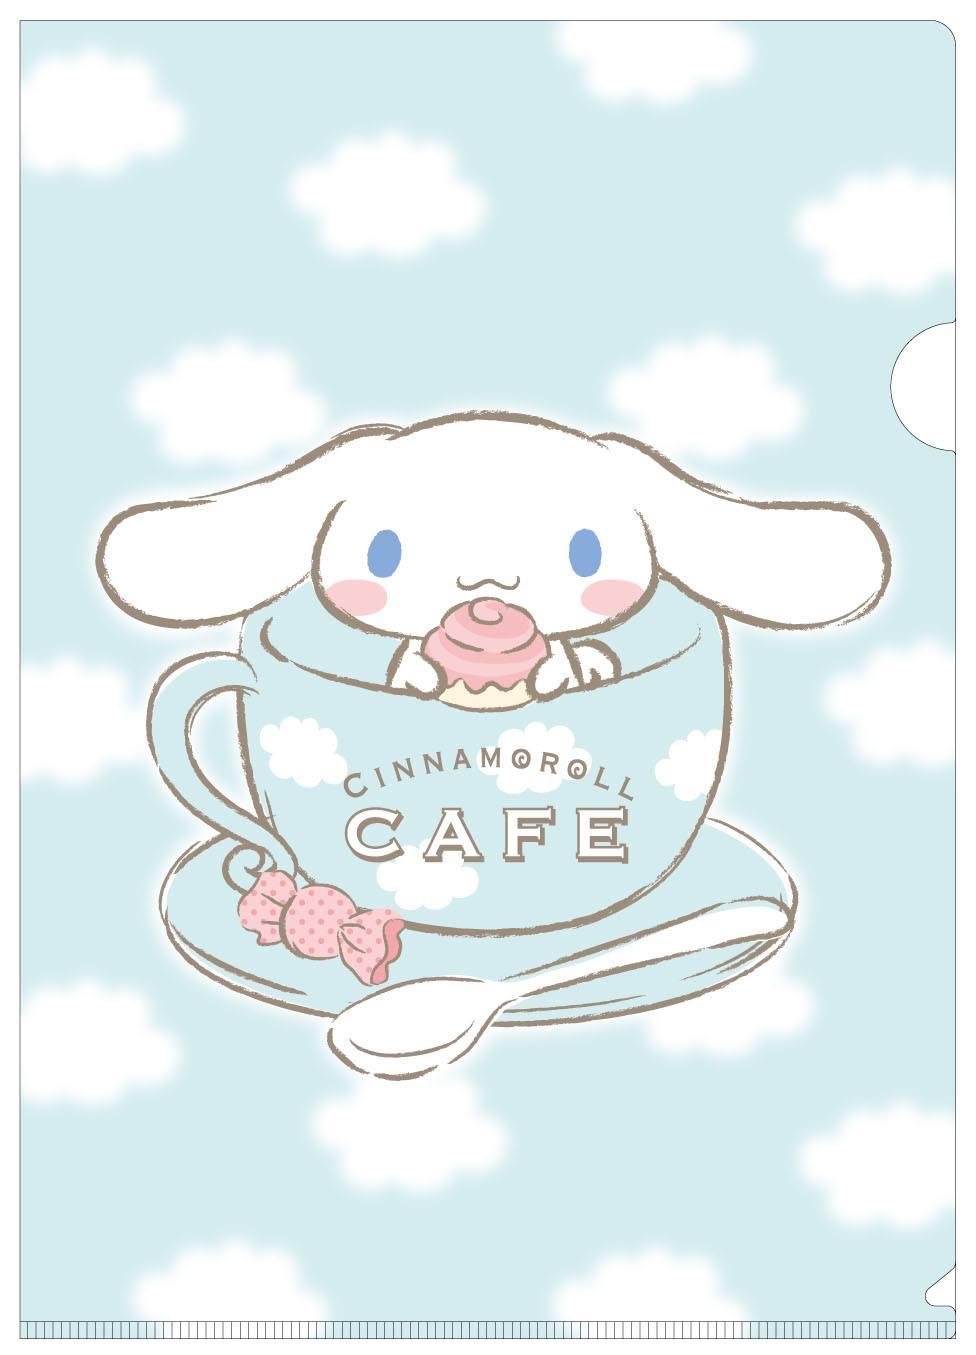 Cinnamoroll Cafe To Open In Shibuya Kawaii Kakkoii Sugoi